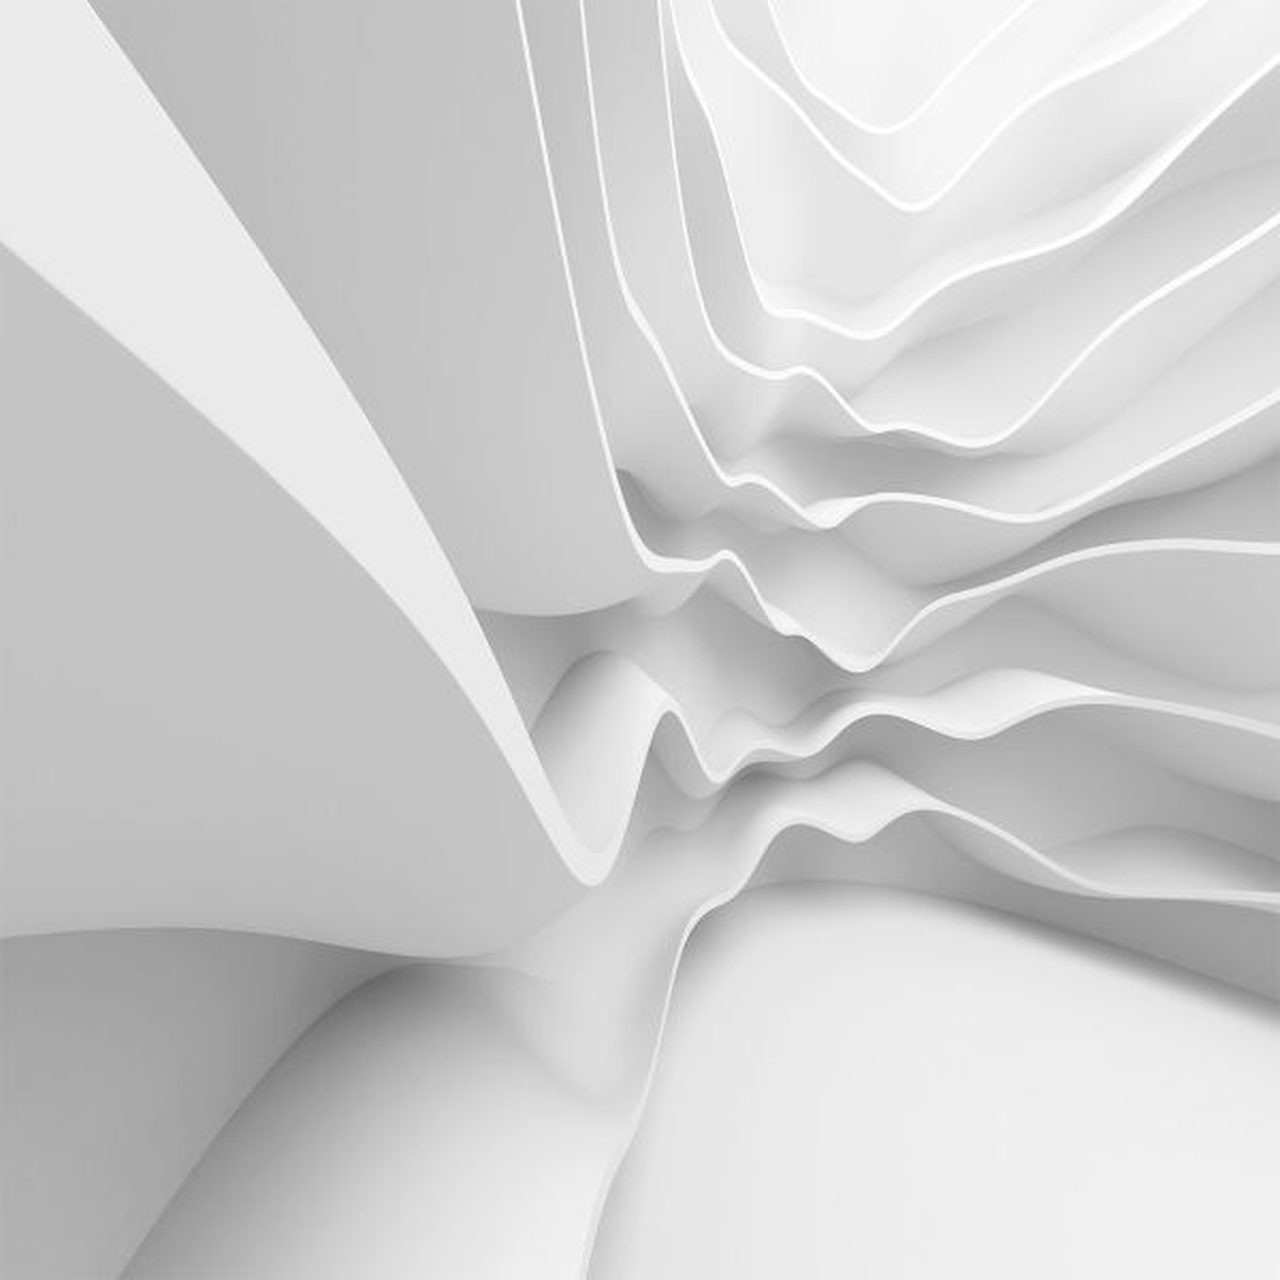 کاغذ دیواری سه بعدی ویولت دکور طرح P5